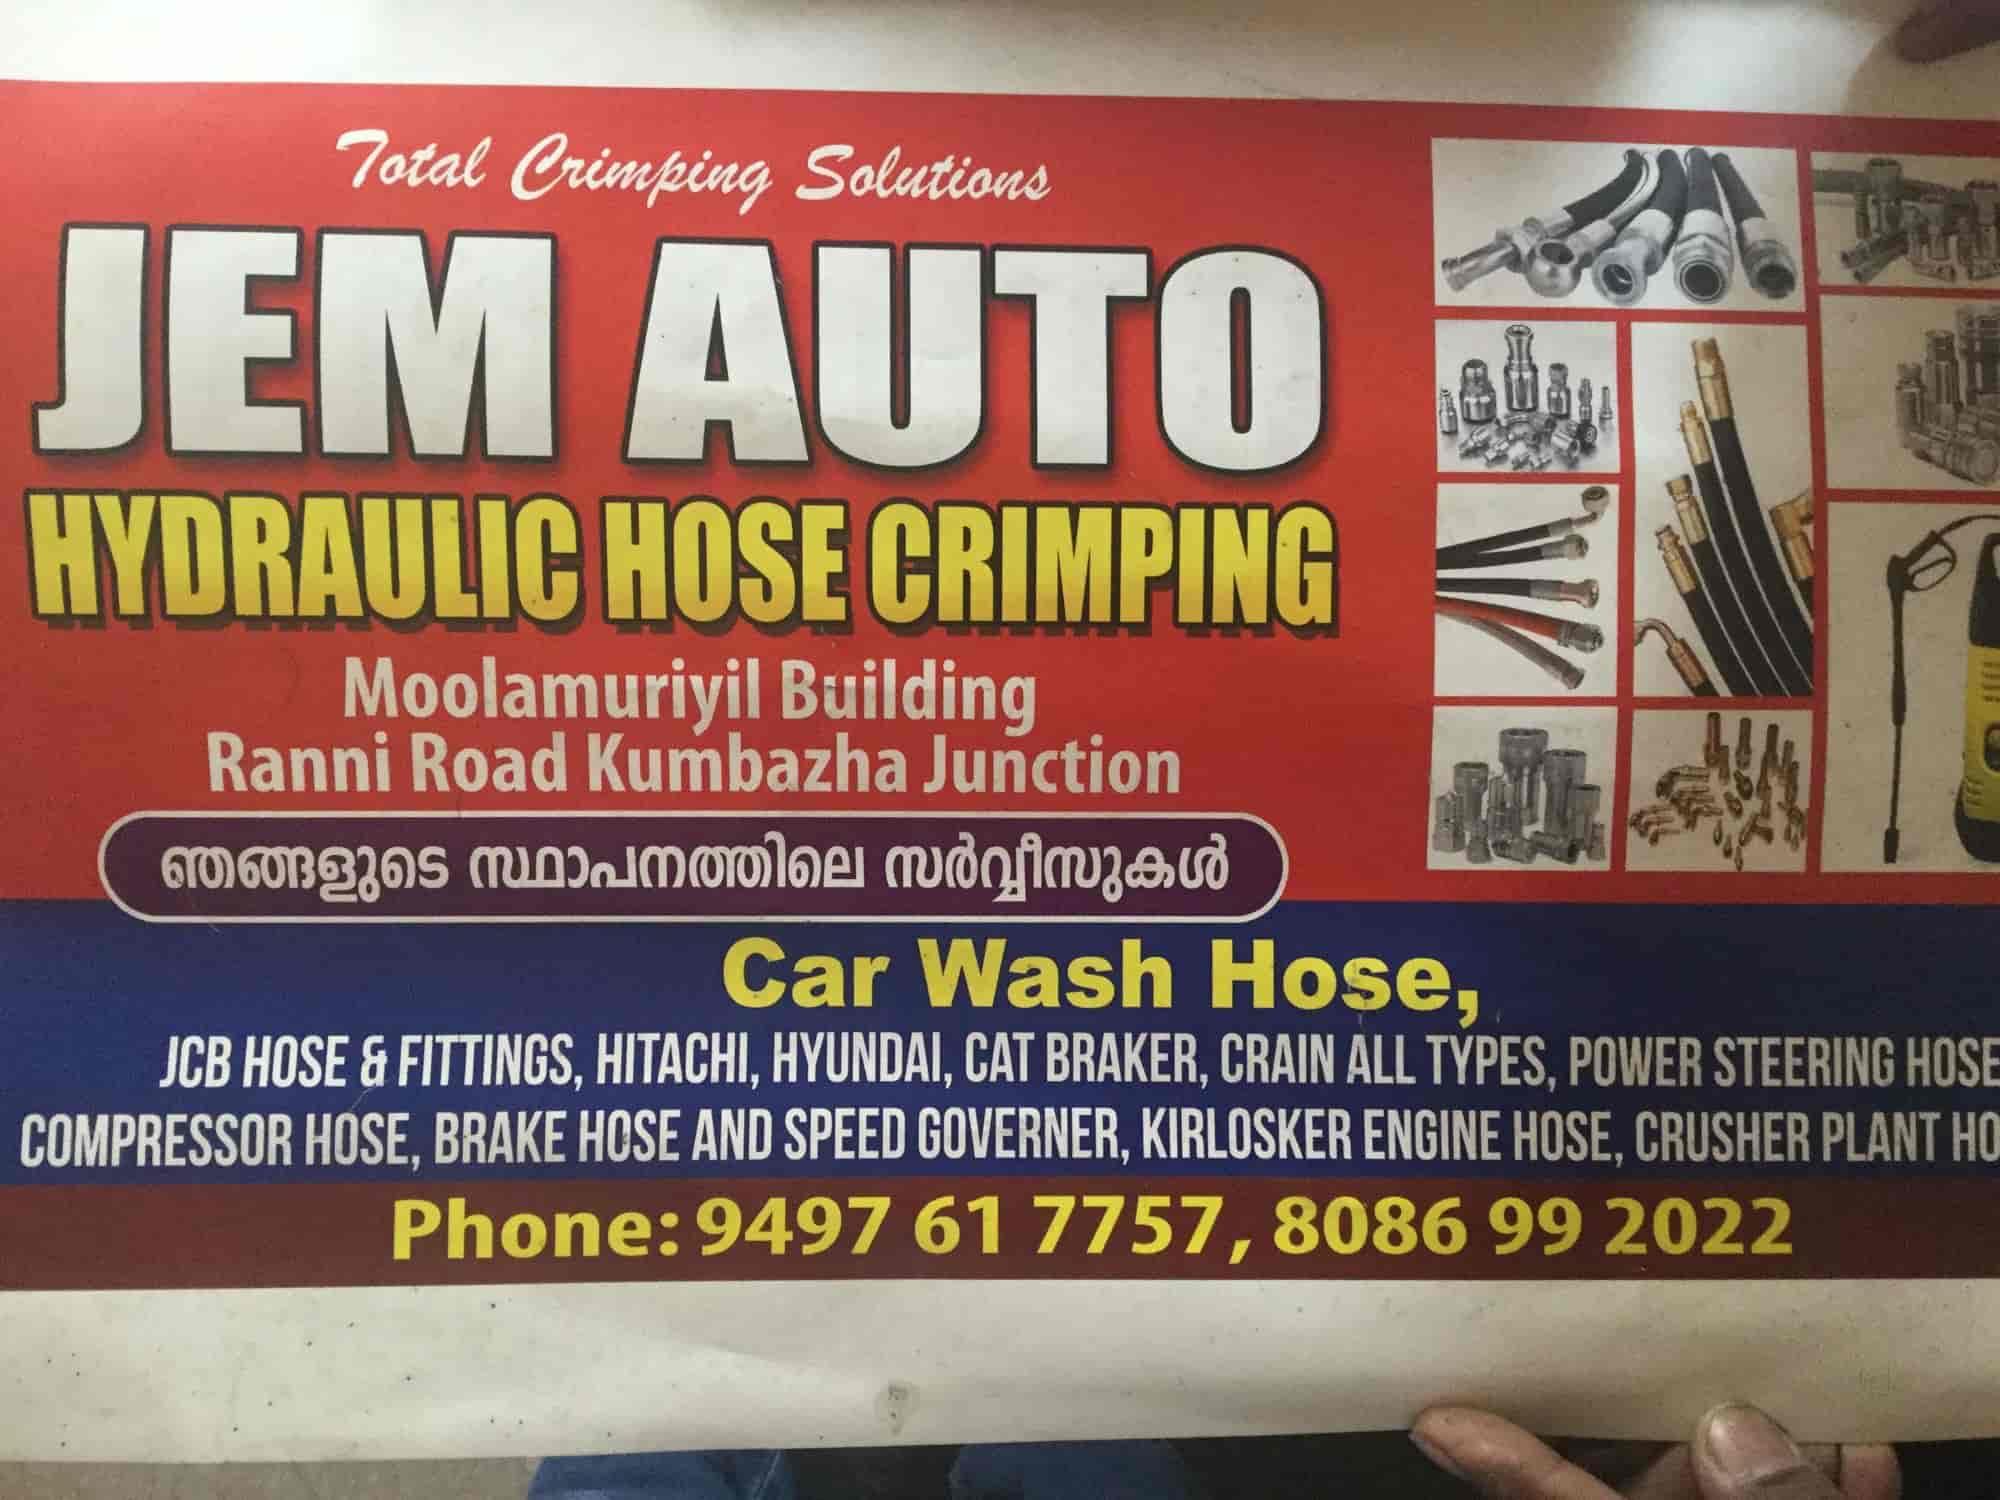 JEM AUTO Hydraulic HOSE Crimping, Pathanamthitta HO